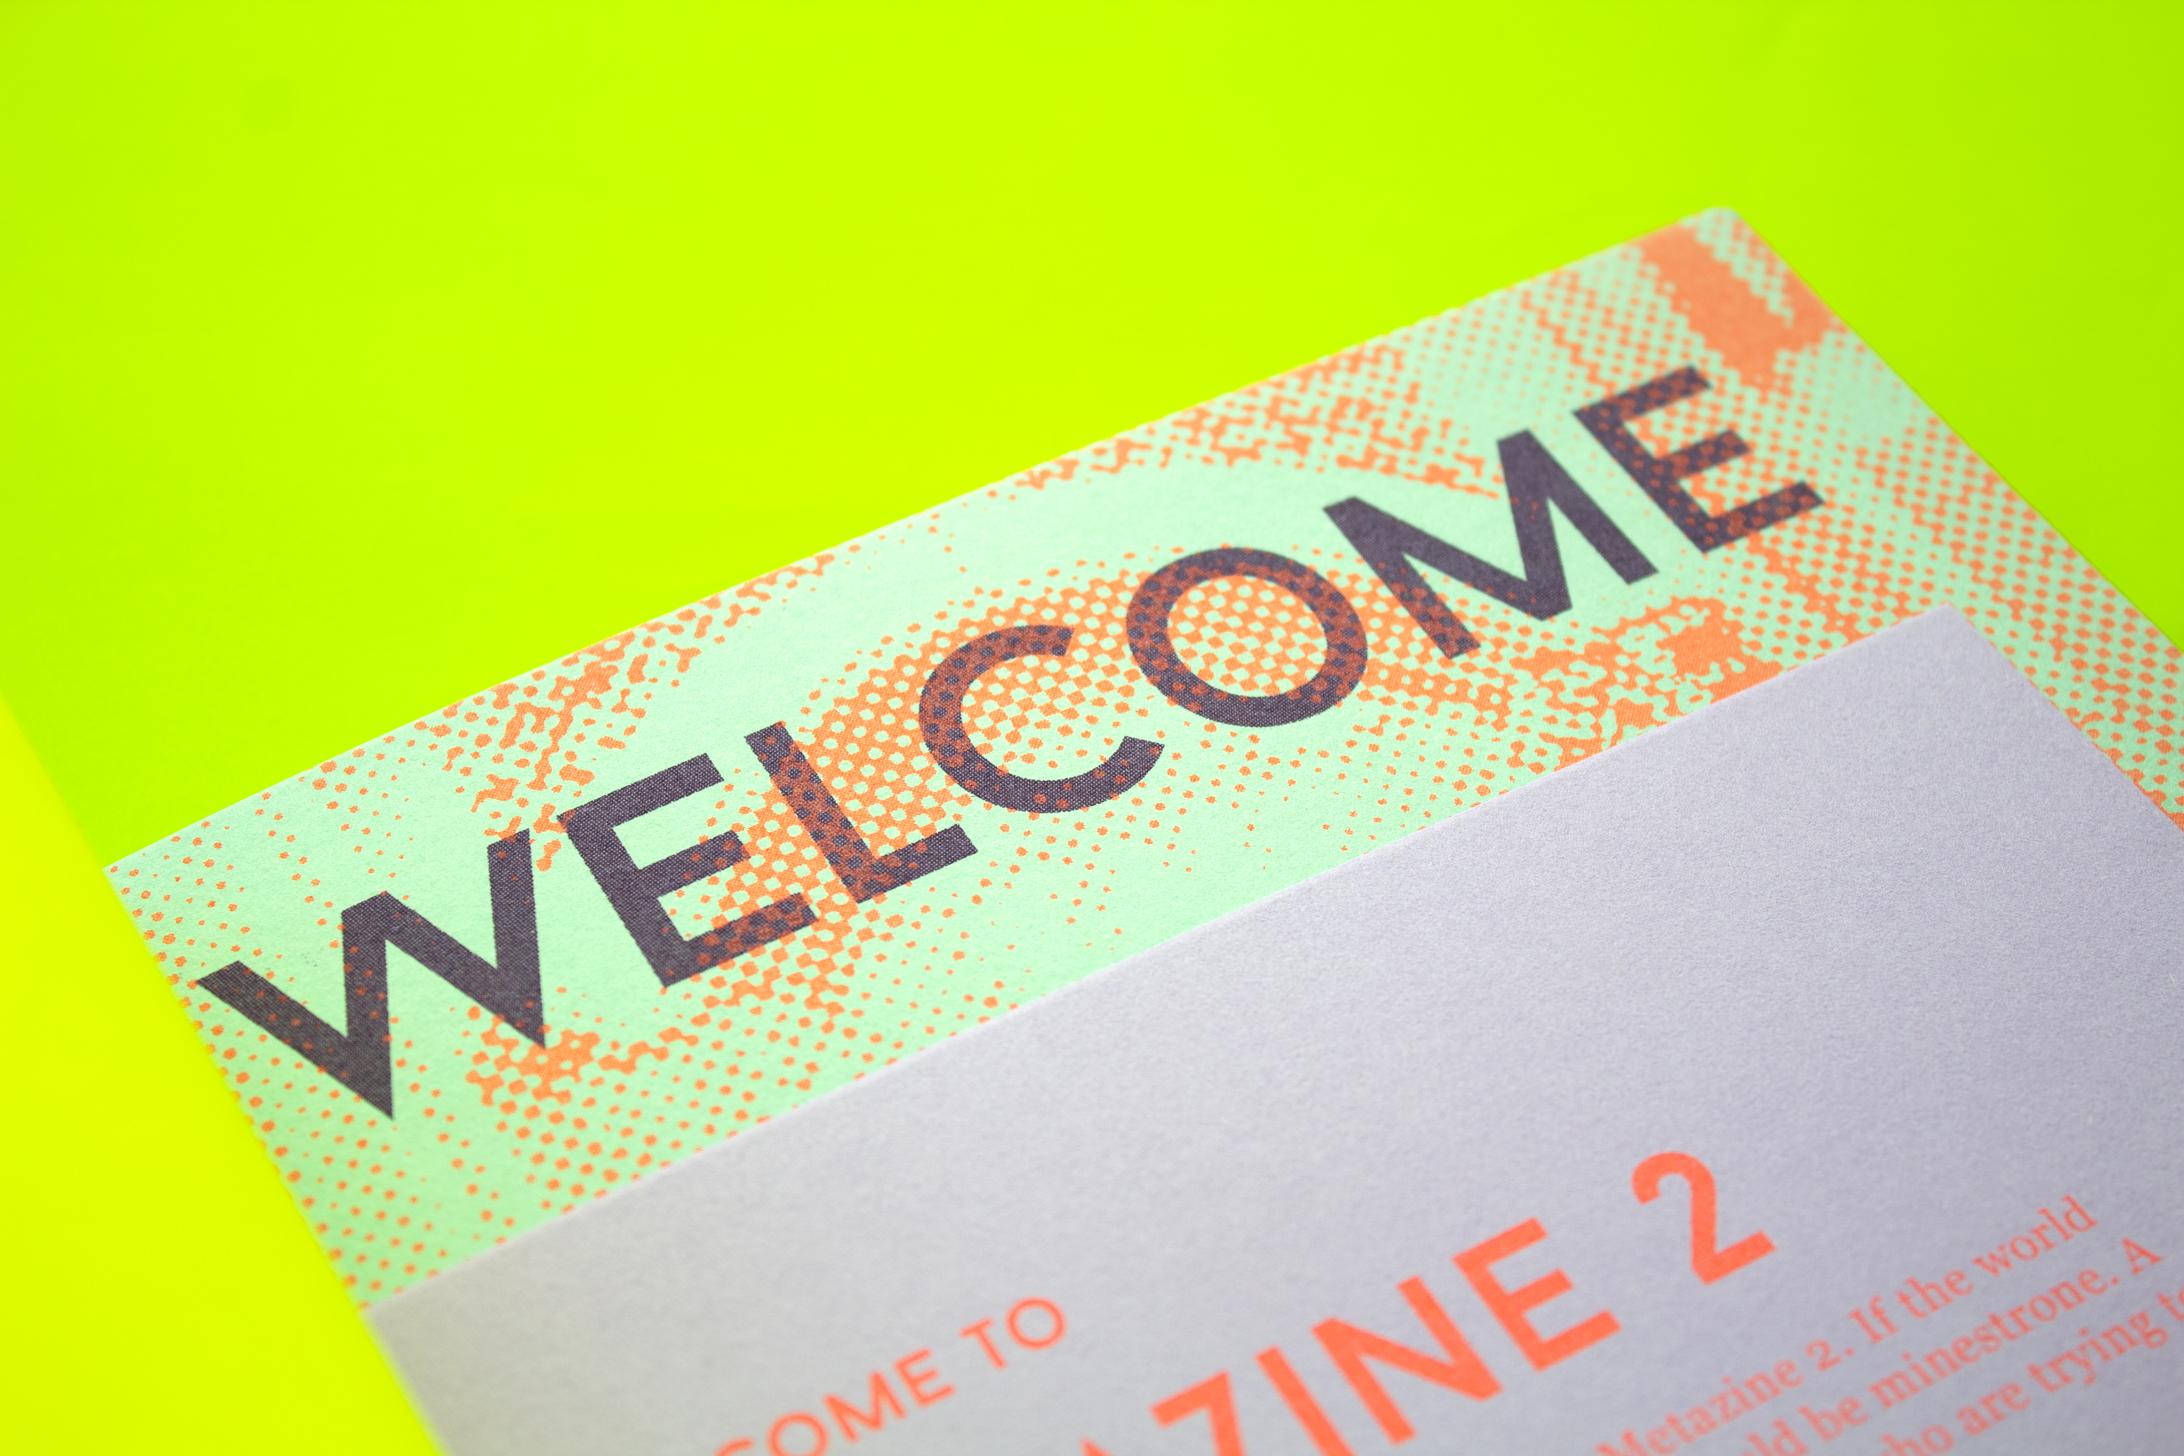 Metazine Issue 2 - Dizzy Ink - Book Design - Risograph.jpg